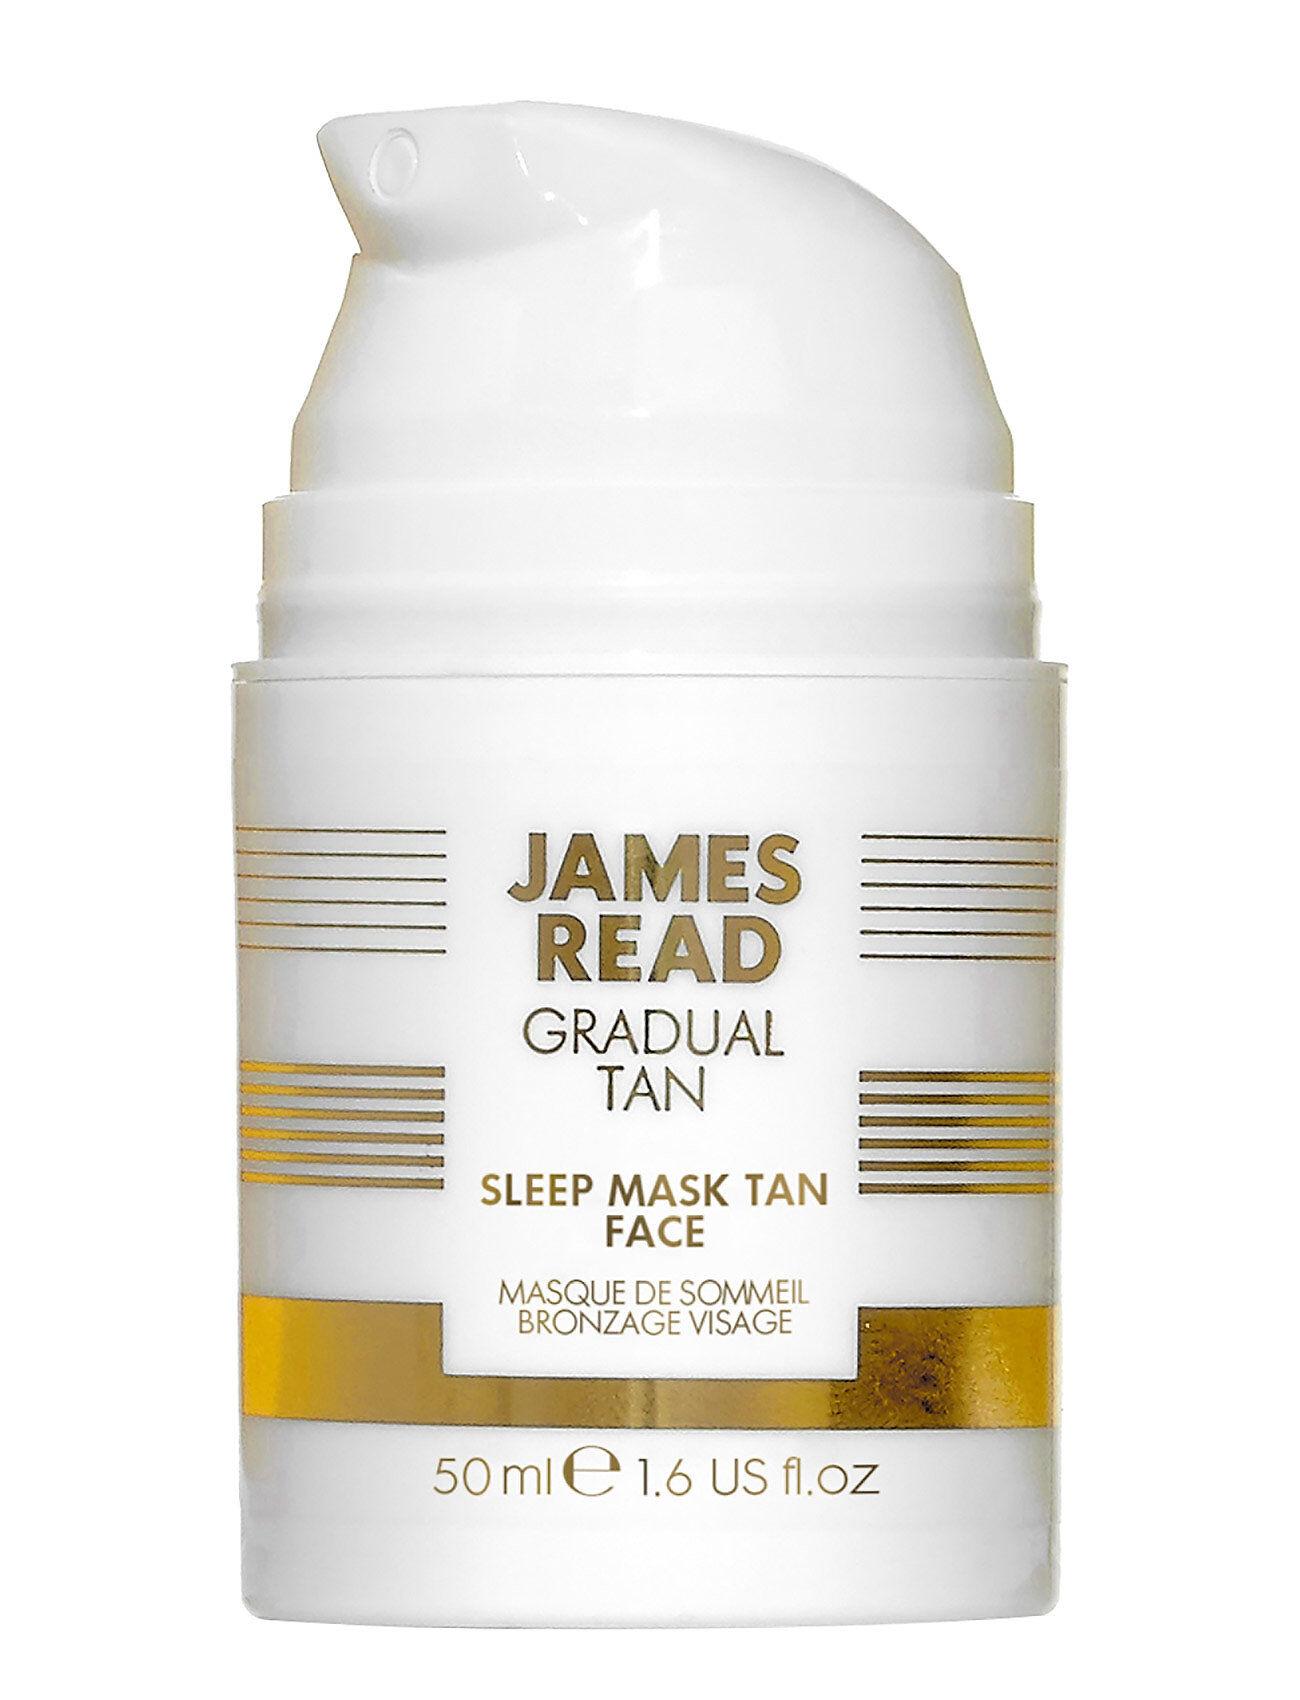 James Read Sleep Mask Tan Face Beauty WOMEN Skin Care Sun Products Self Tanners Nude James Read